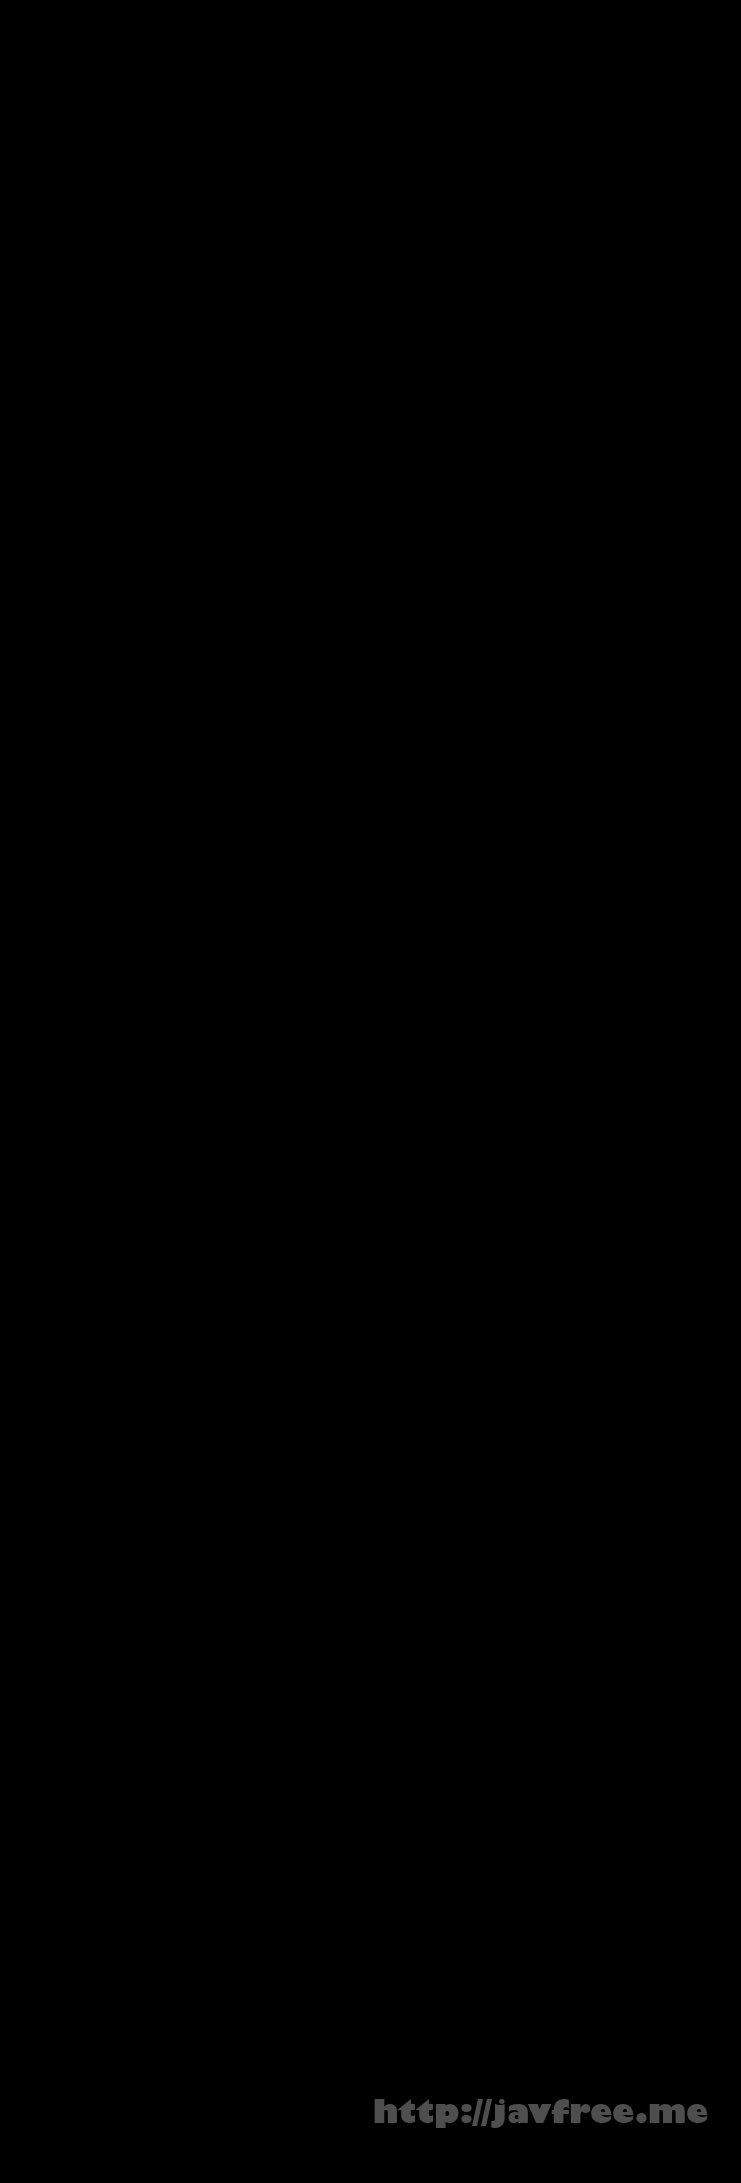 [AUKS-099] ハニトラレズビアン ~インテリ変態女事務次官VS女レズスパイ!!~ 伊東沙蘭 片瀬仁美 - image AUKS-099 on https://javfree.me